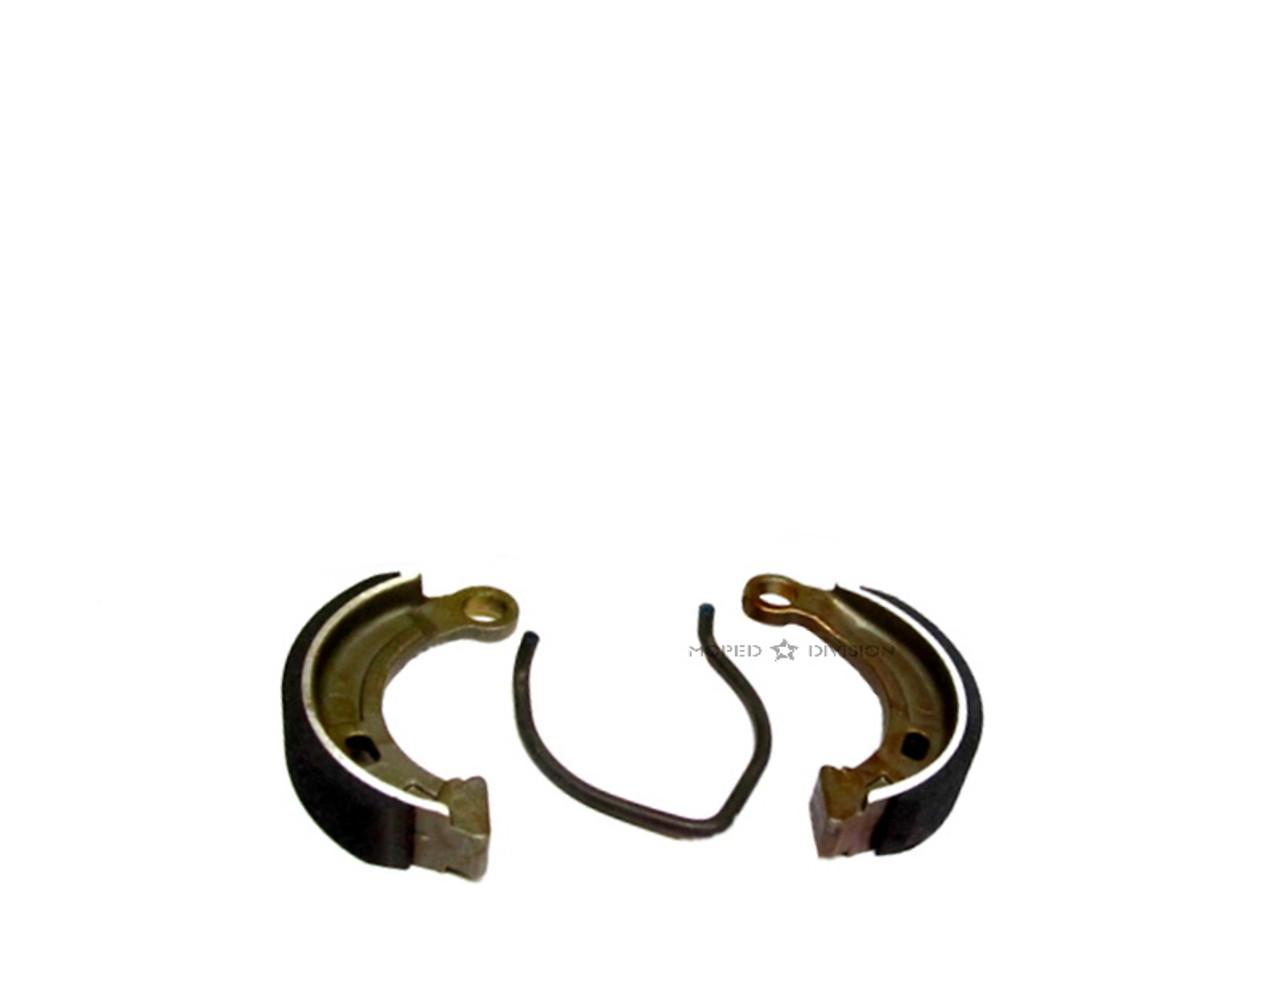 Brake Shoe Set 90mm x 18mm, Circle End Single Spring, Ferodo